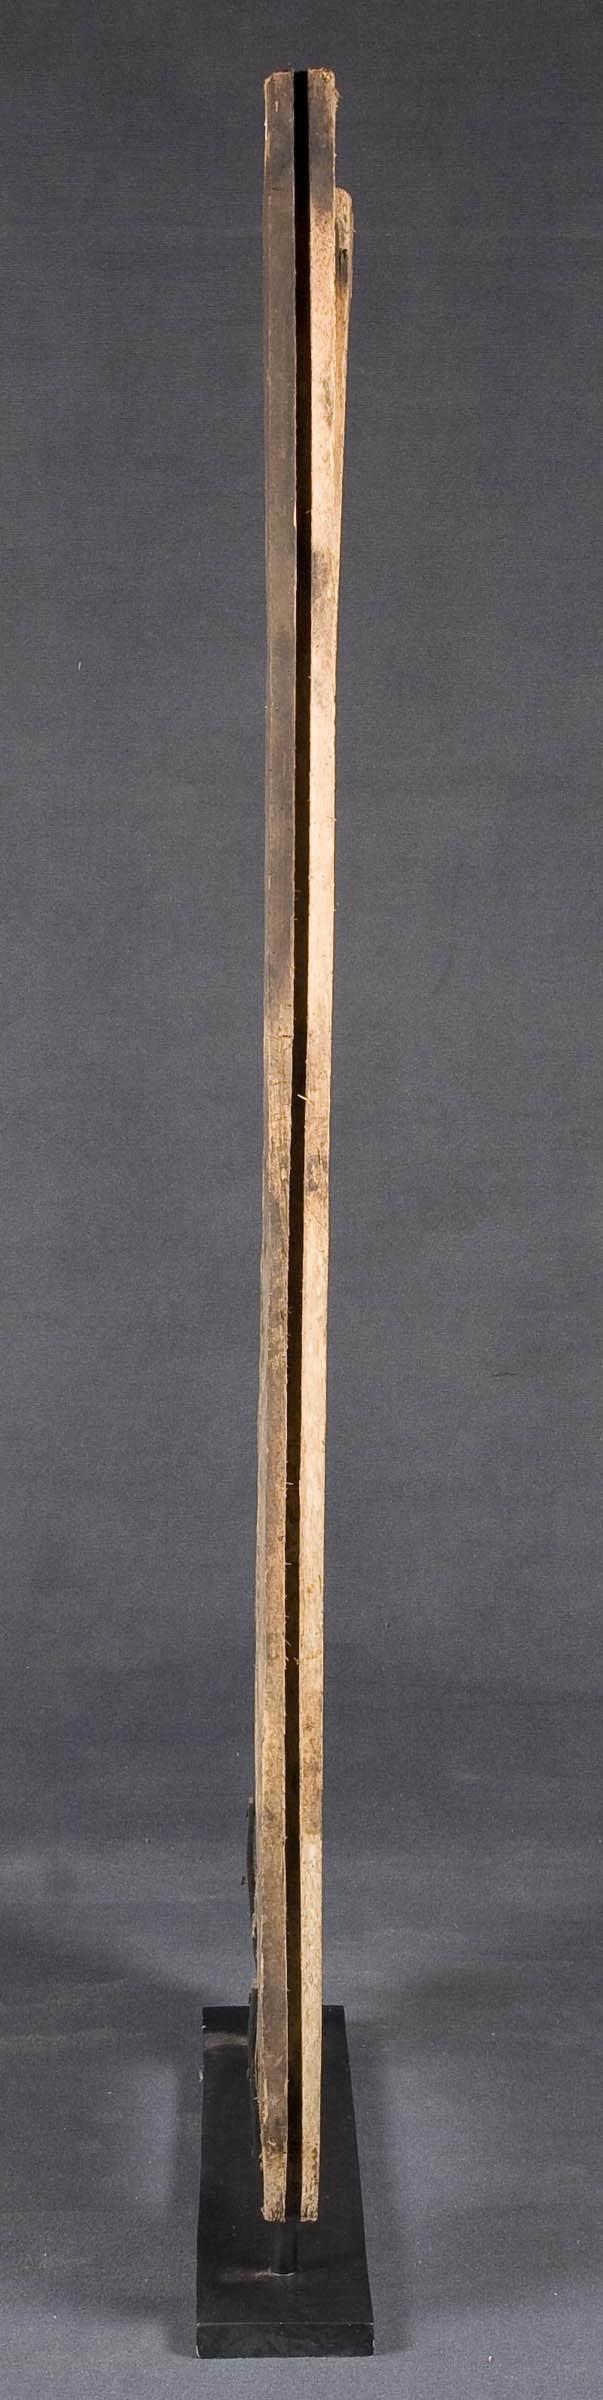 Escultura de panel antiguo